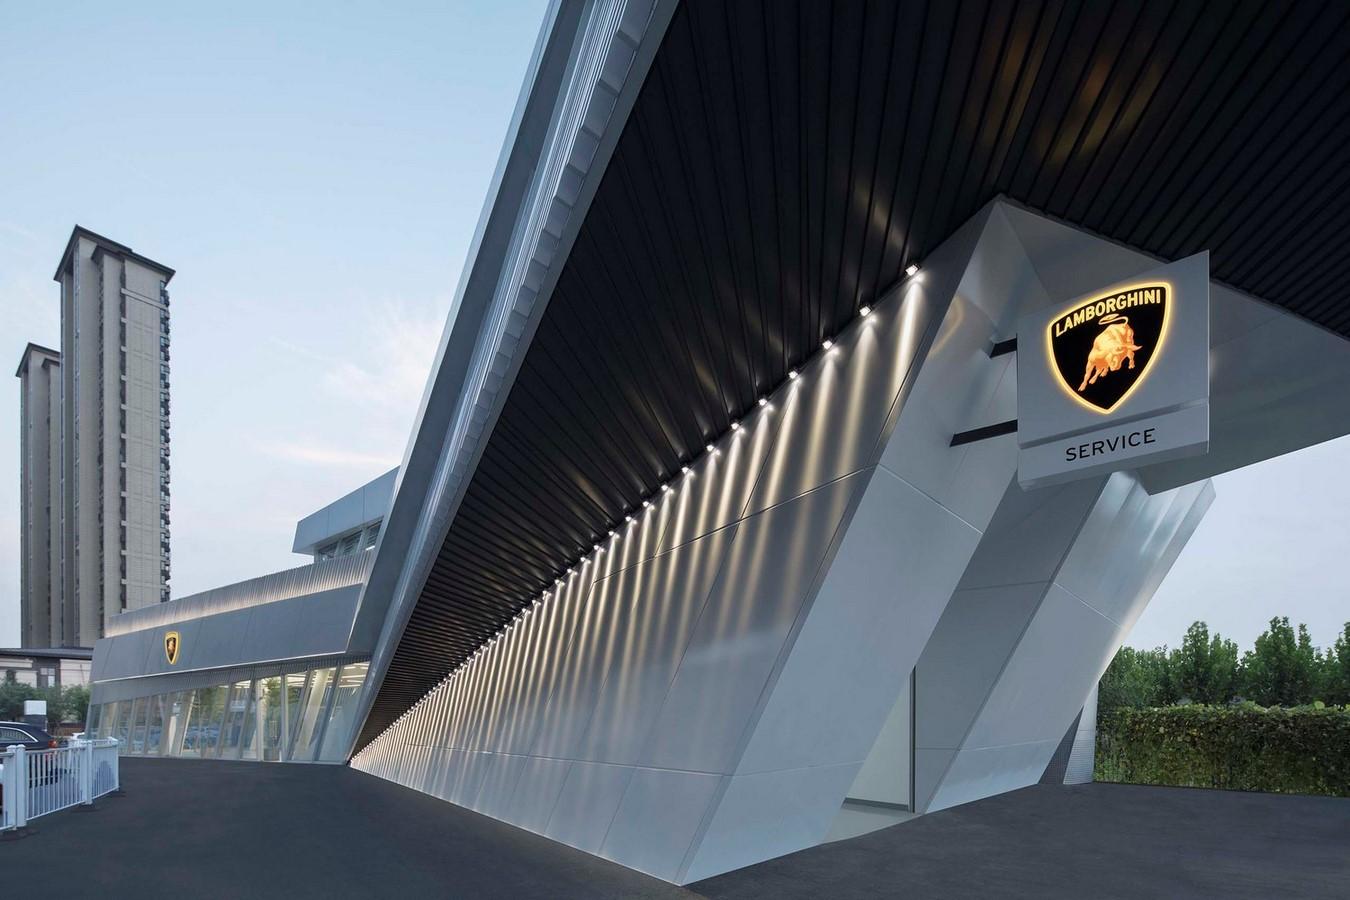 Lamborghini Exhibition Centre - Sheet1